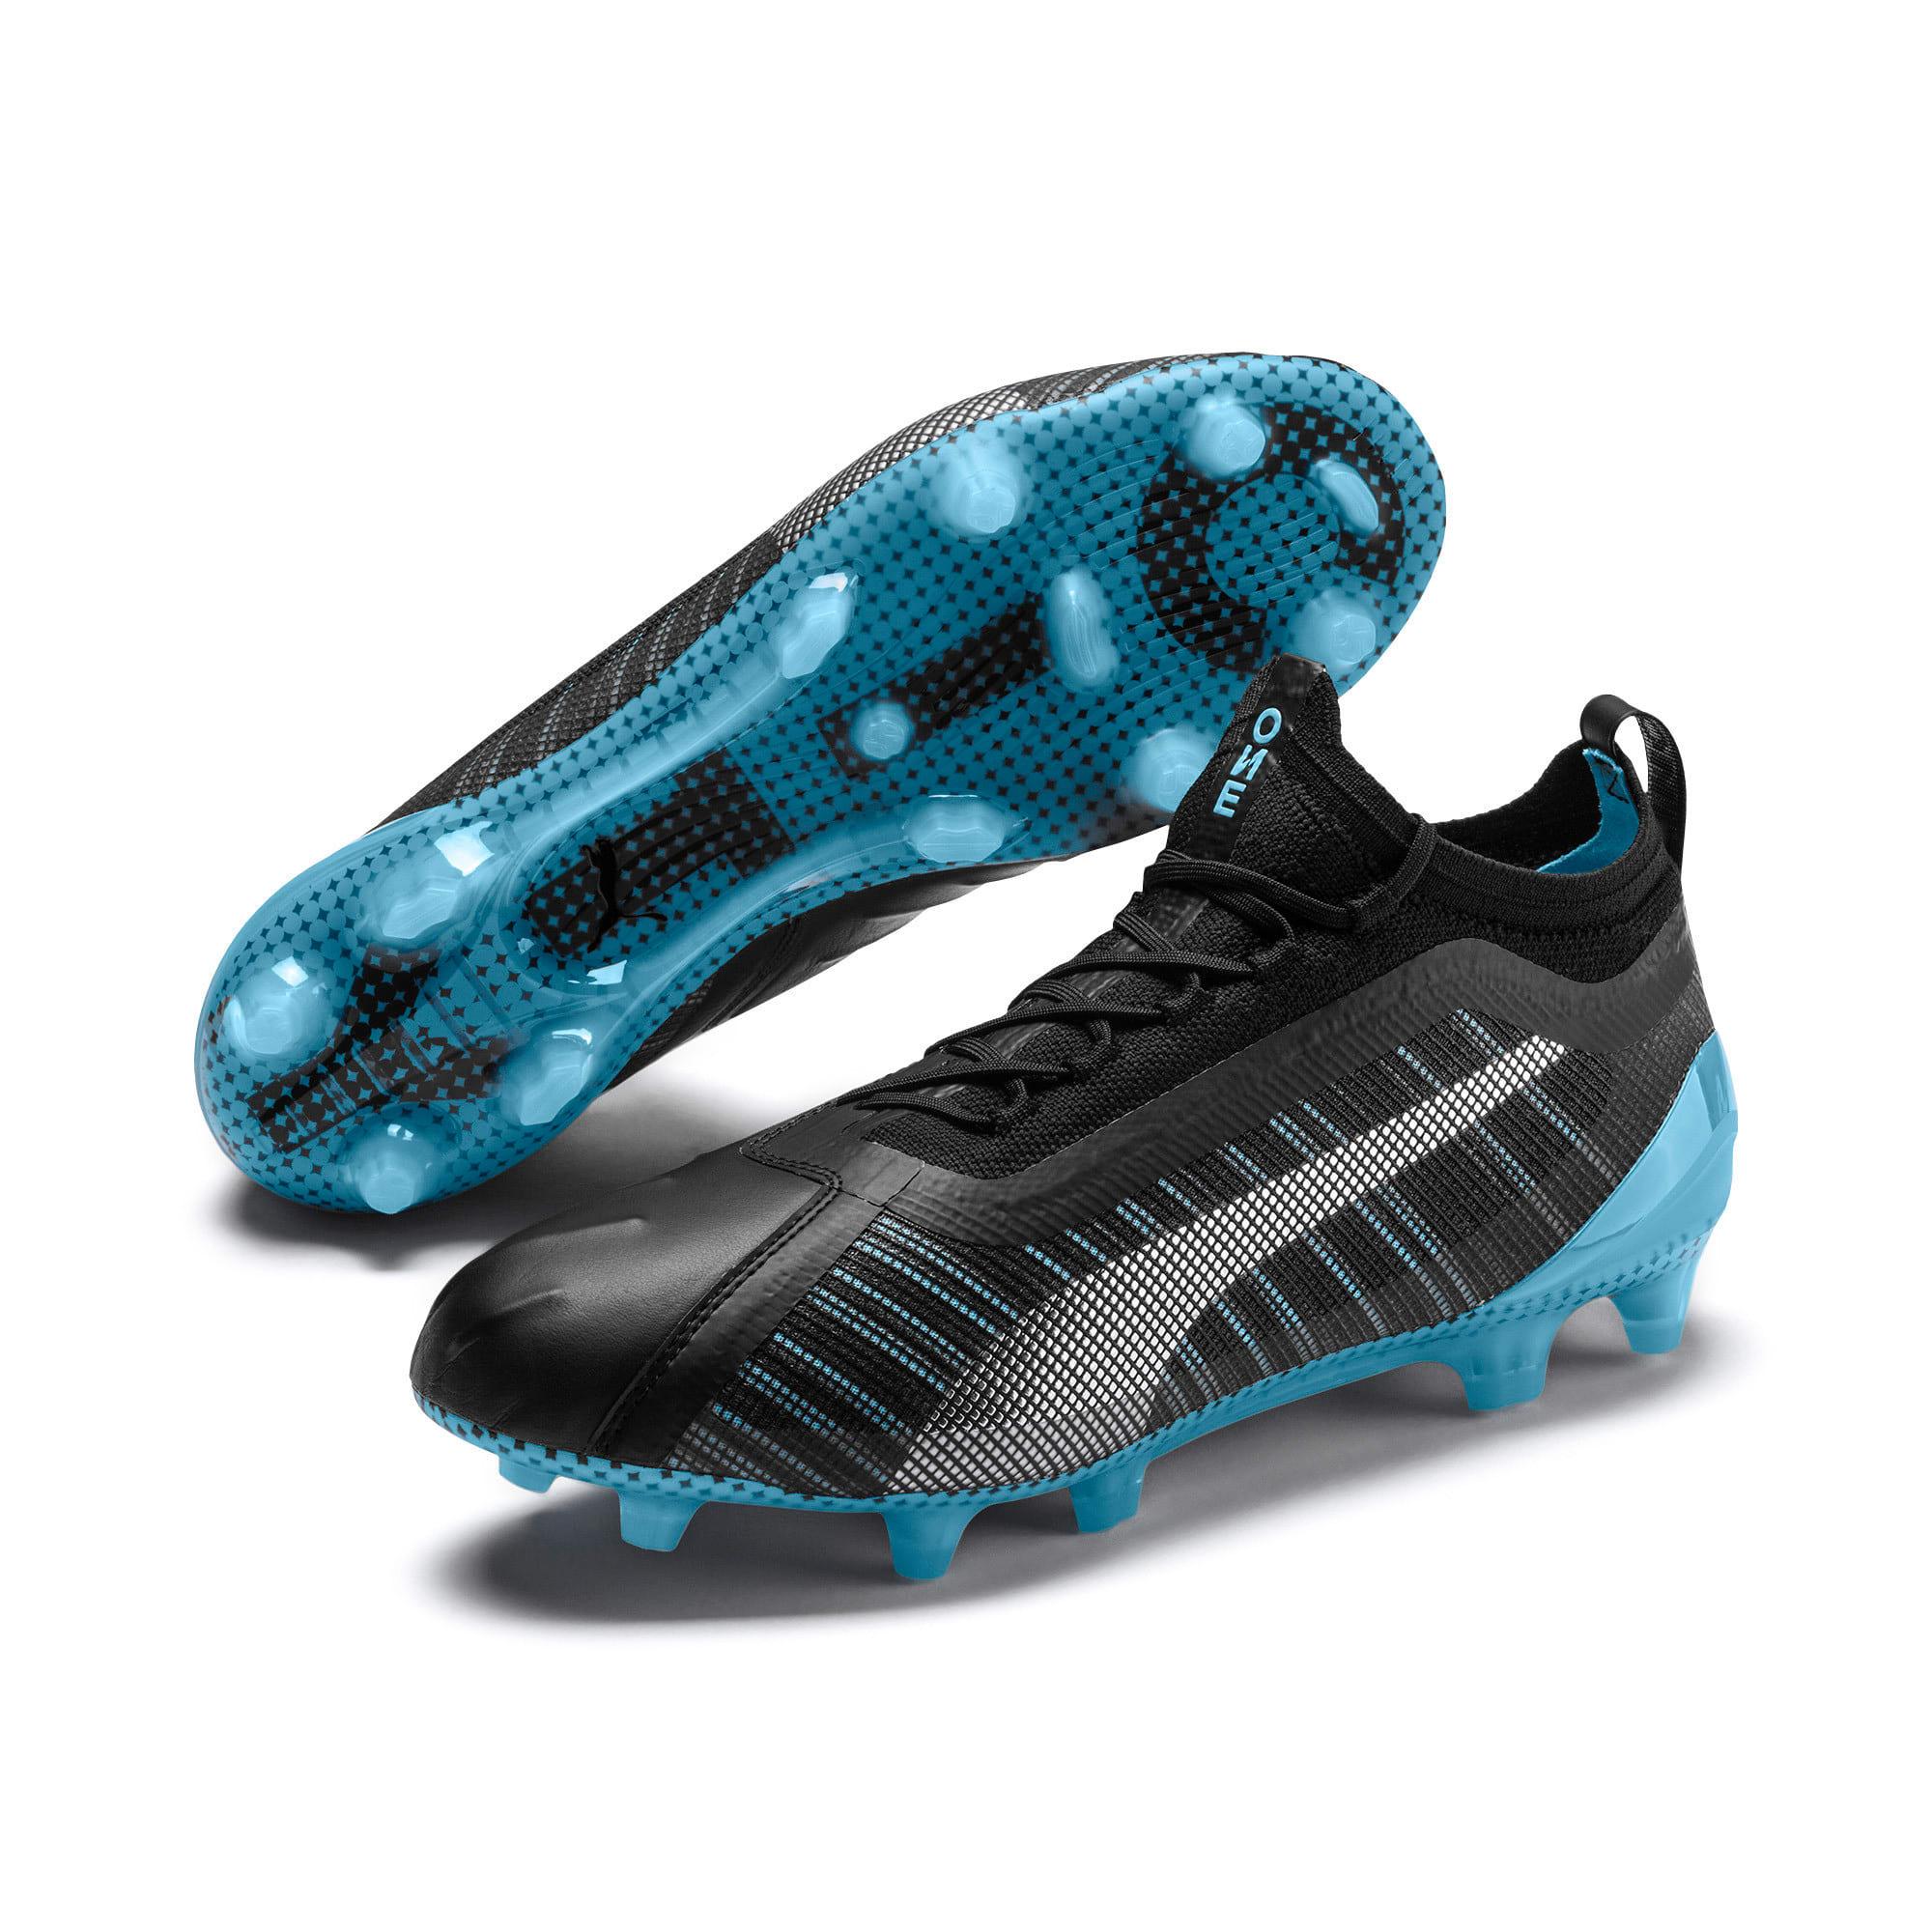 Imagen en miniatura 3 de Botas de fútbol de hombre PUMA ONE 5.1 City, Black-Sky Blue-Silver, mediana